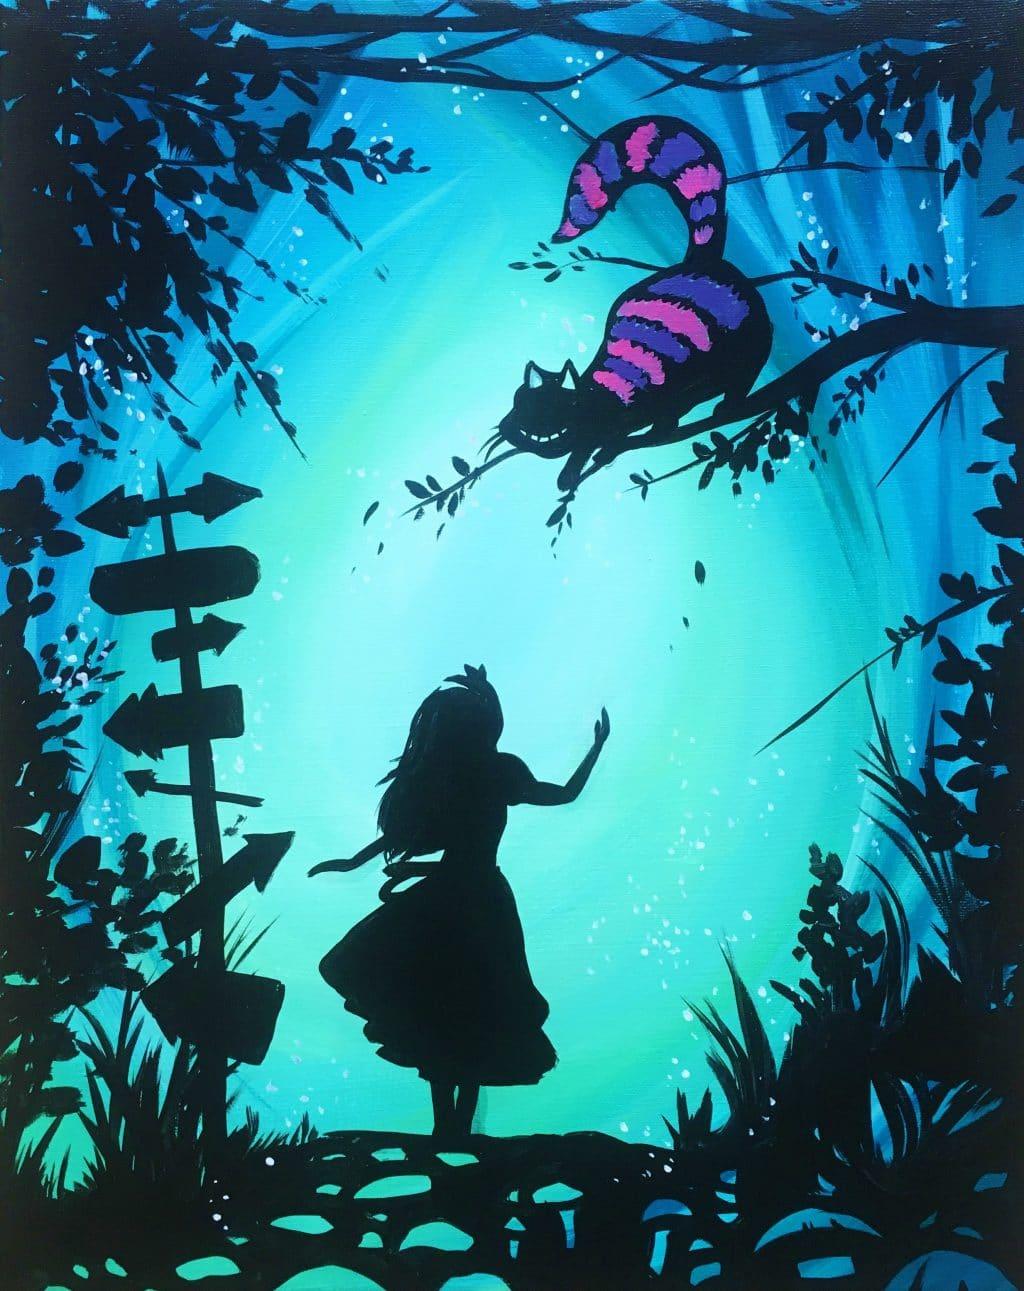 alice in wonderland princess paint uncorked canvas. Black Bedroom Furniture Sets. Home Design Ideas